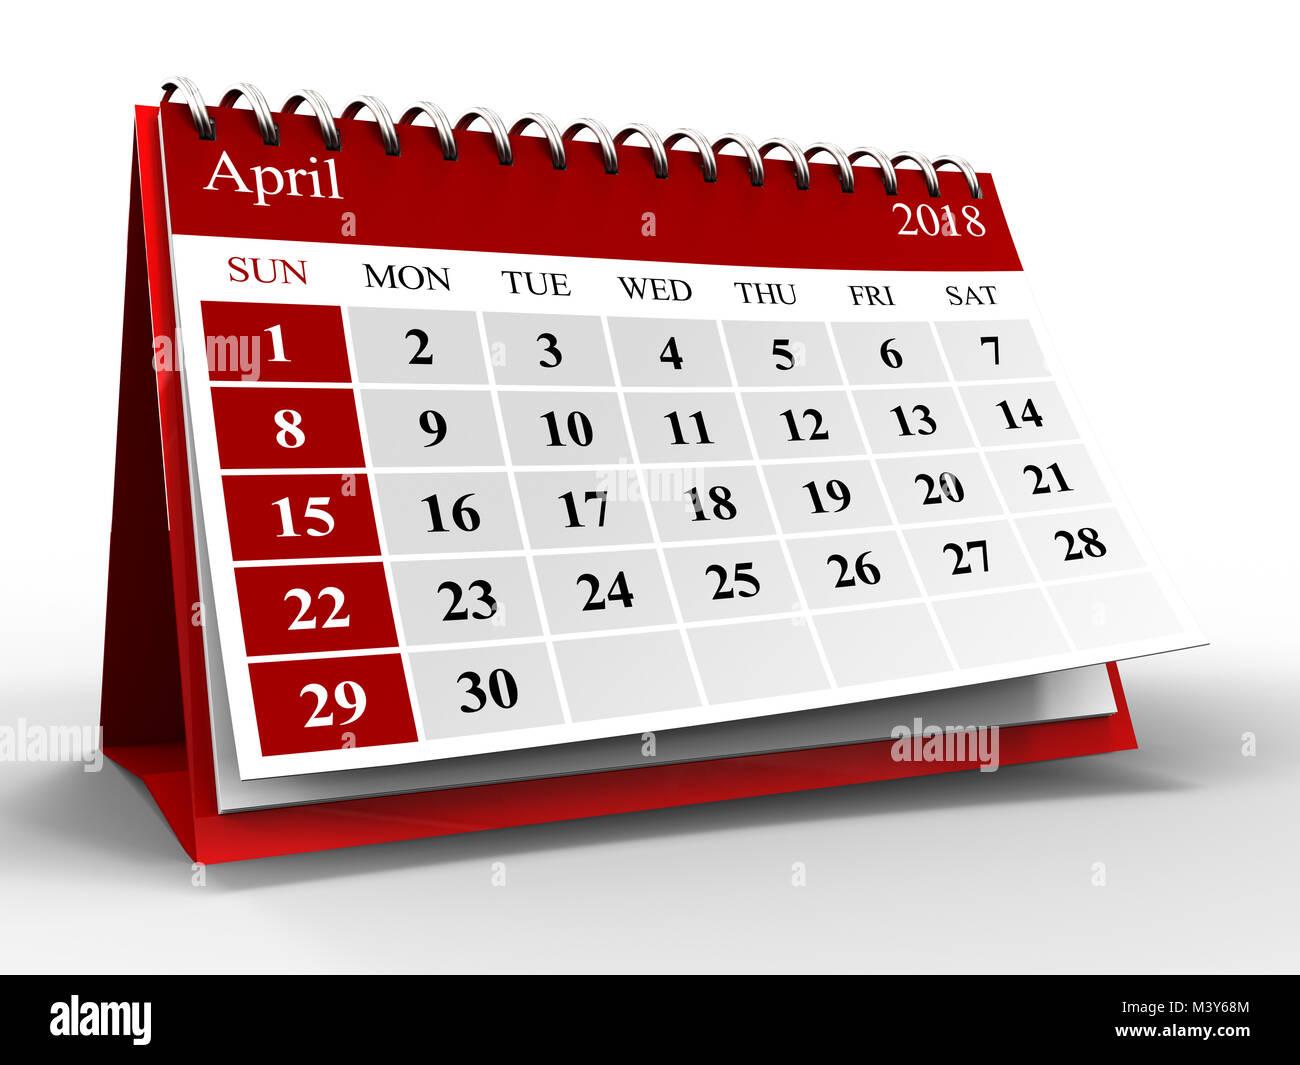 Maxim 2022 Calendar.3d Illustration Of Calendar Over White With Shadow April 2018 Stock Photo Alamy